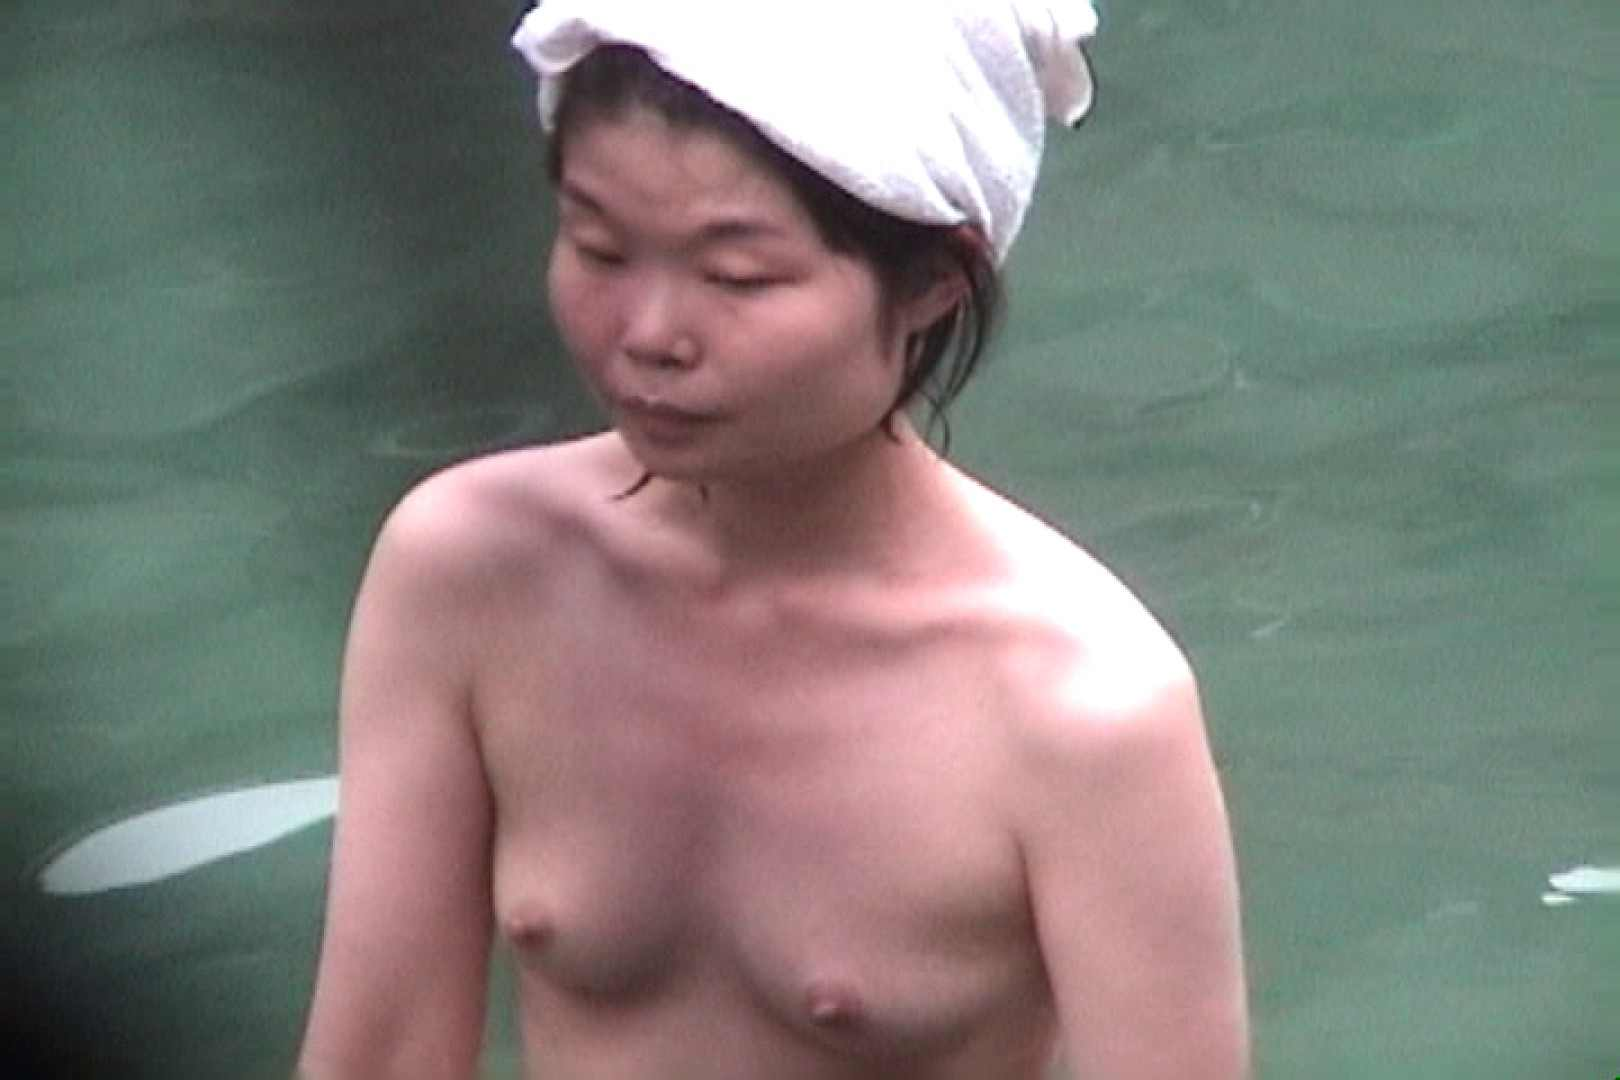 Aquaな露天風呂Vol.71【VIP限定】 OLエロ画像 覗きオメコ動画キャプチャ 68PICs 26